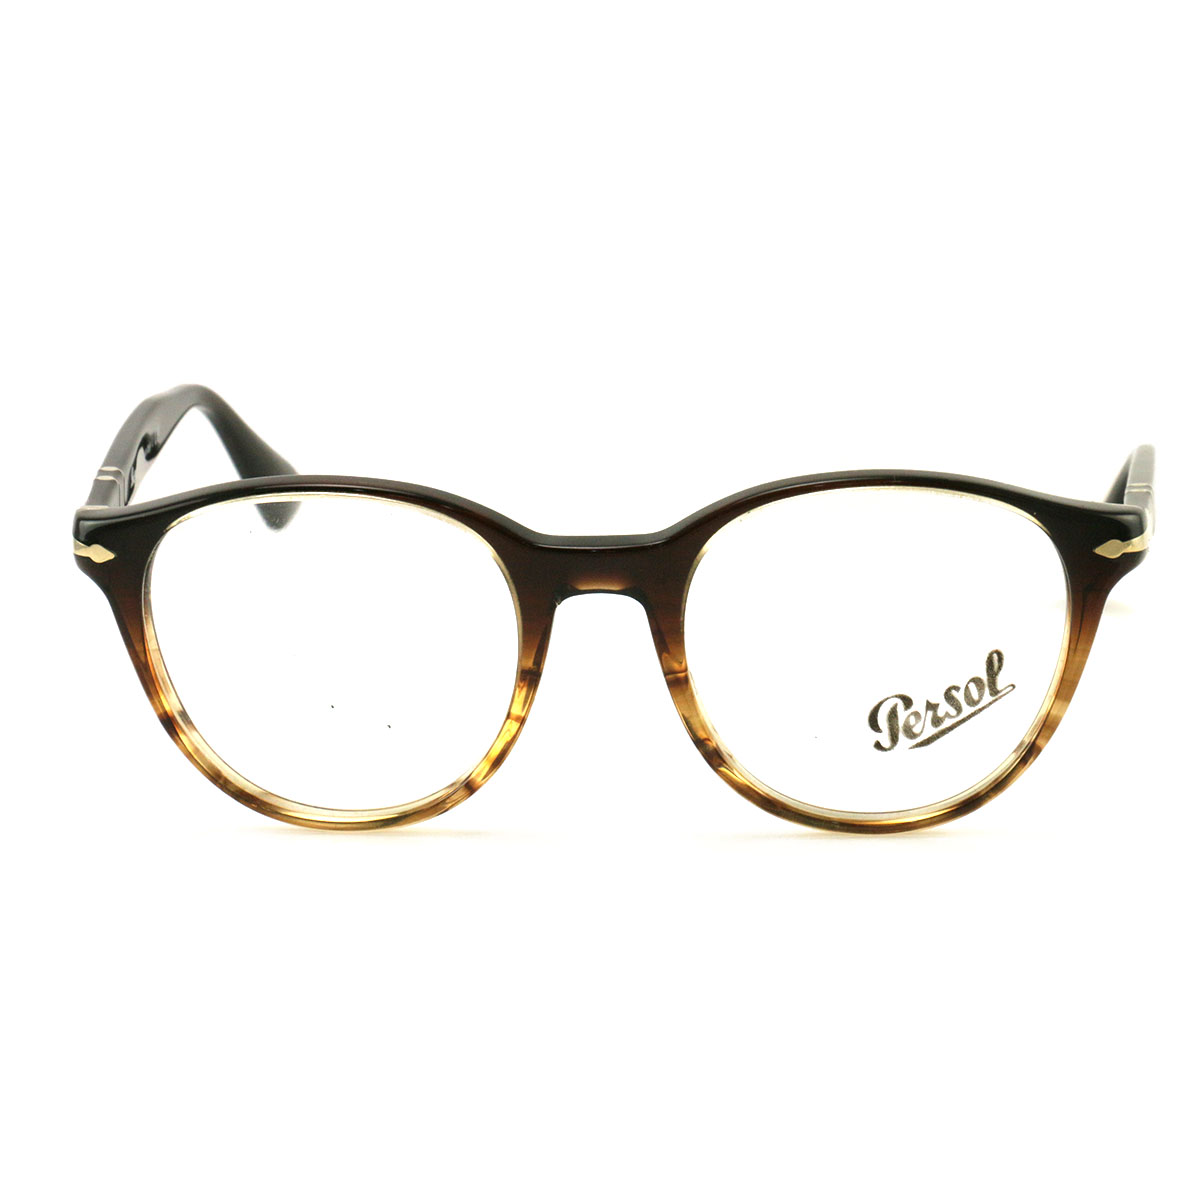 8caa83192f Persol Eyeglasses PO 3153-V 1026 Striped Brown Plastic 50 20 145 Demo Lens